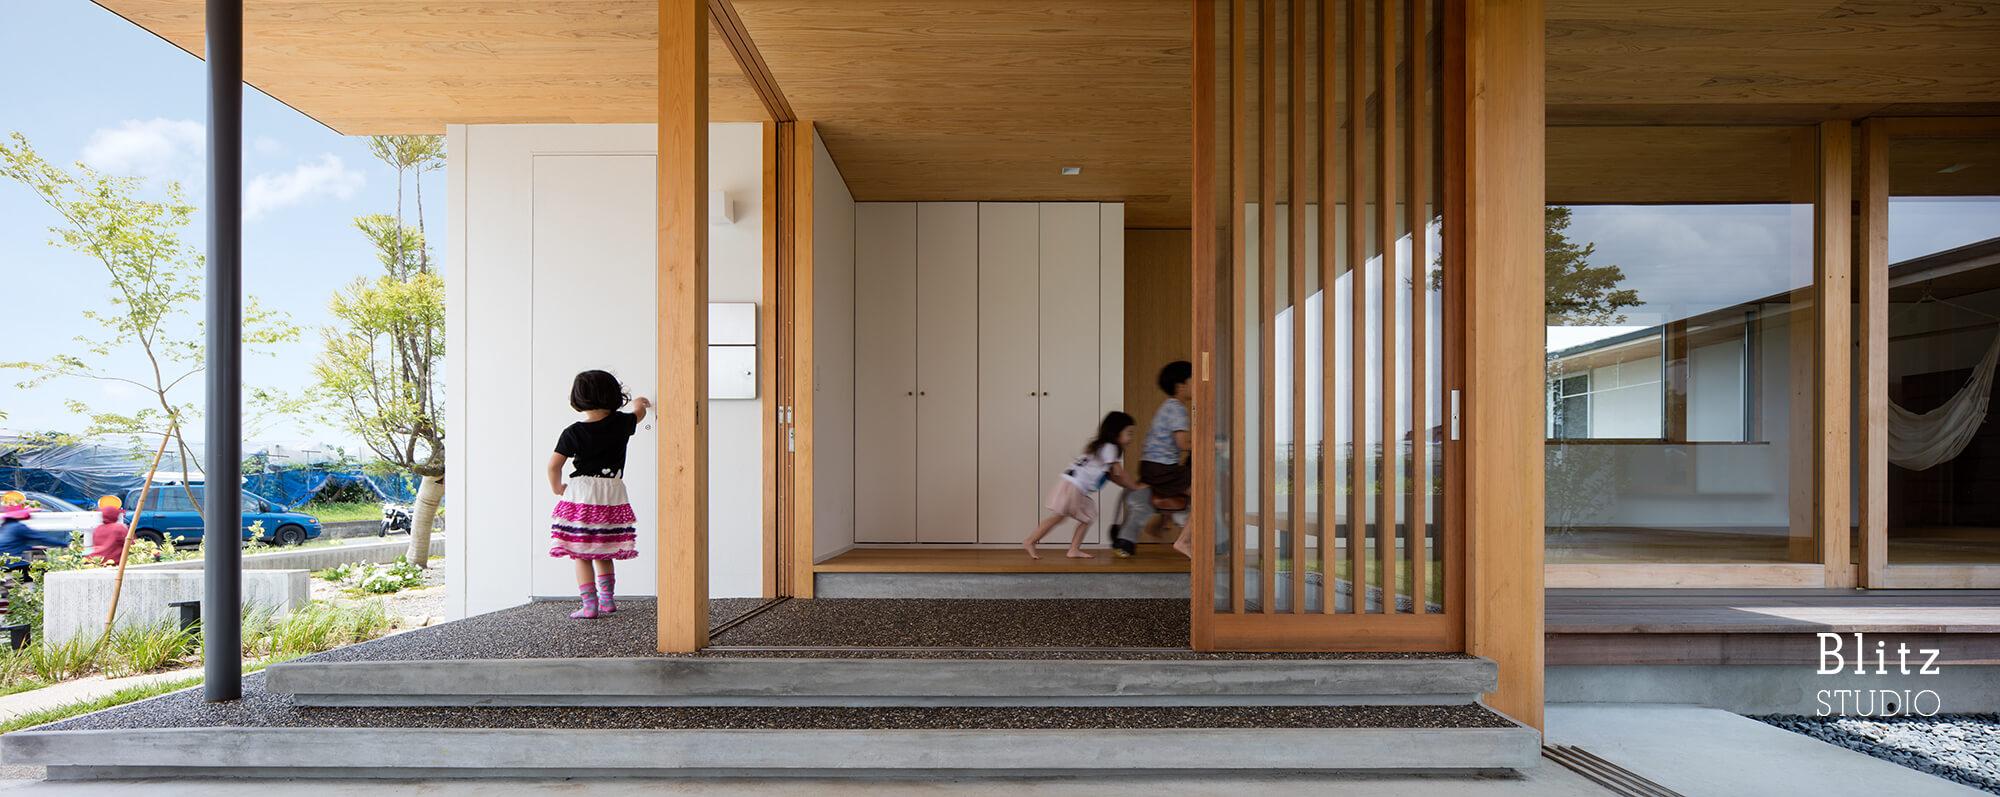 『筑後の家』-佐賀県筑後市-建築写真・竣工写真・インテリア写真3